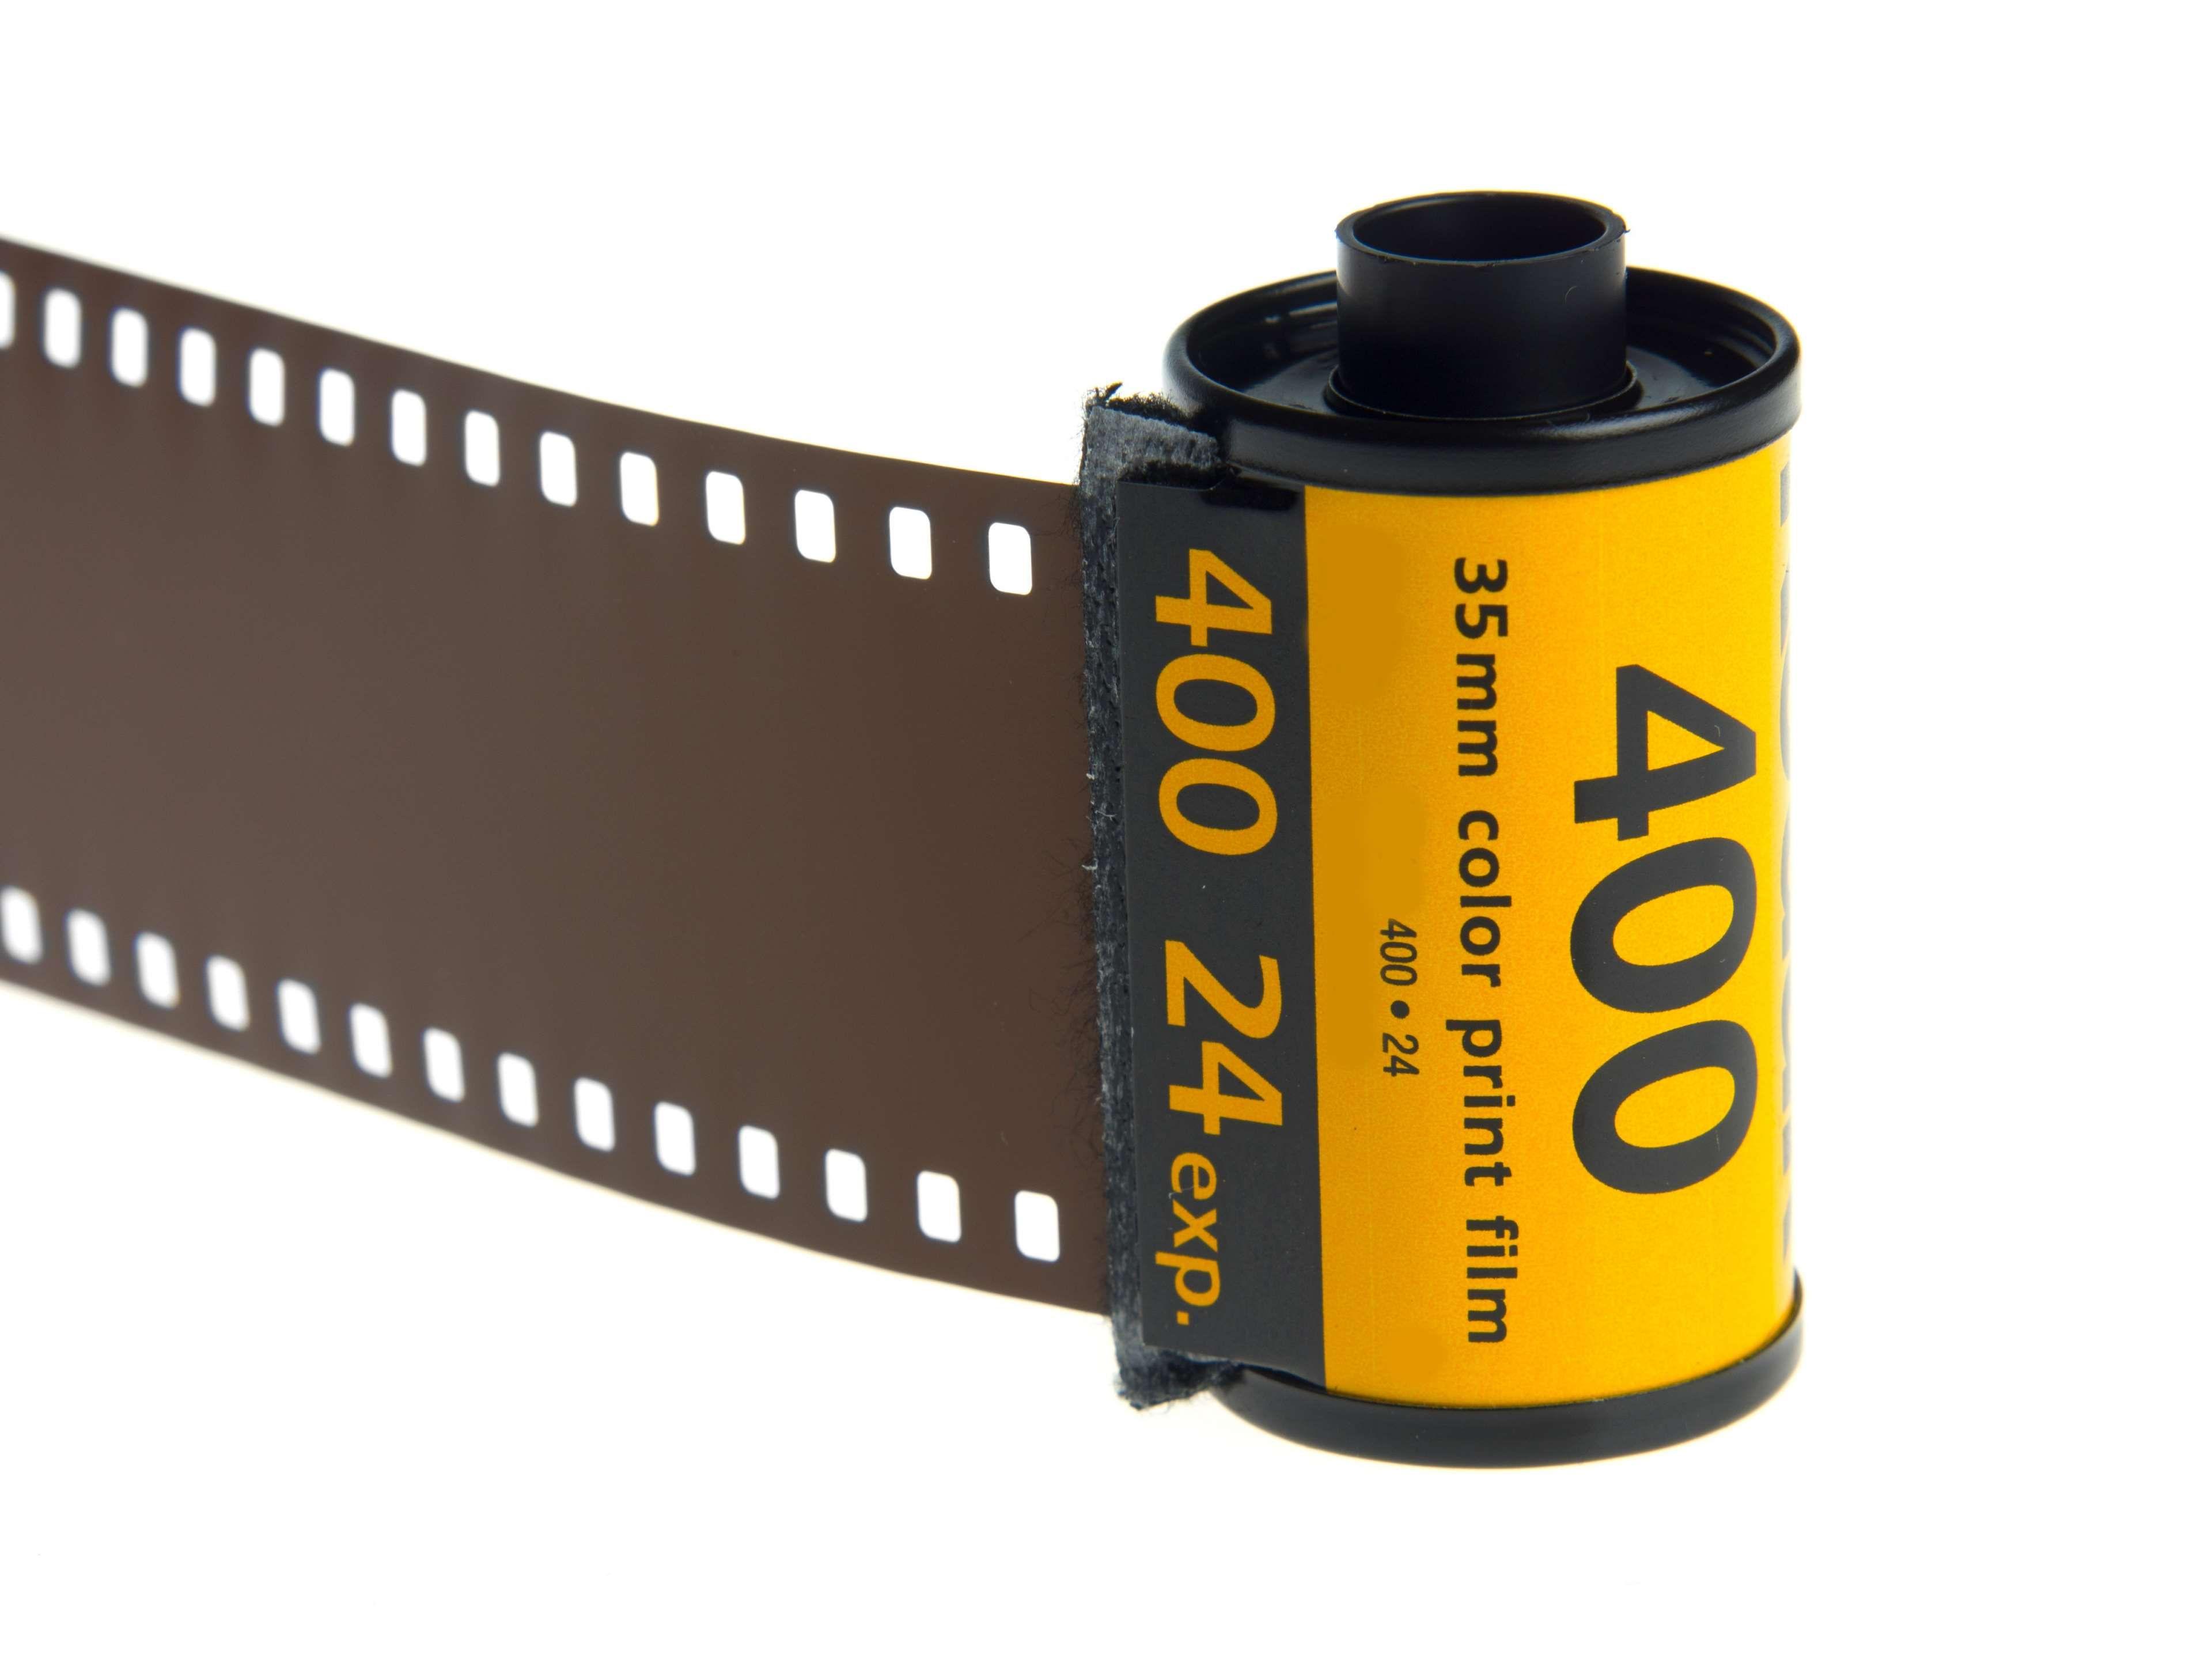 35mm black camera celluloid equipment film focal